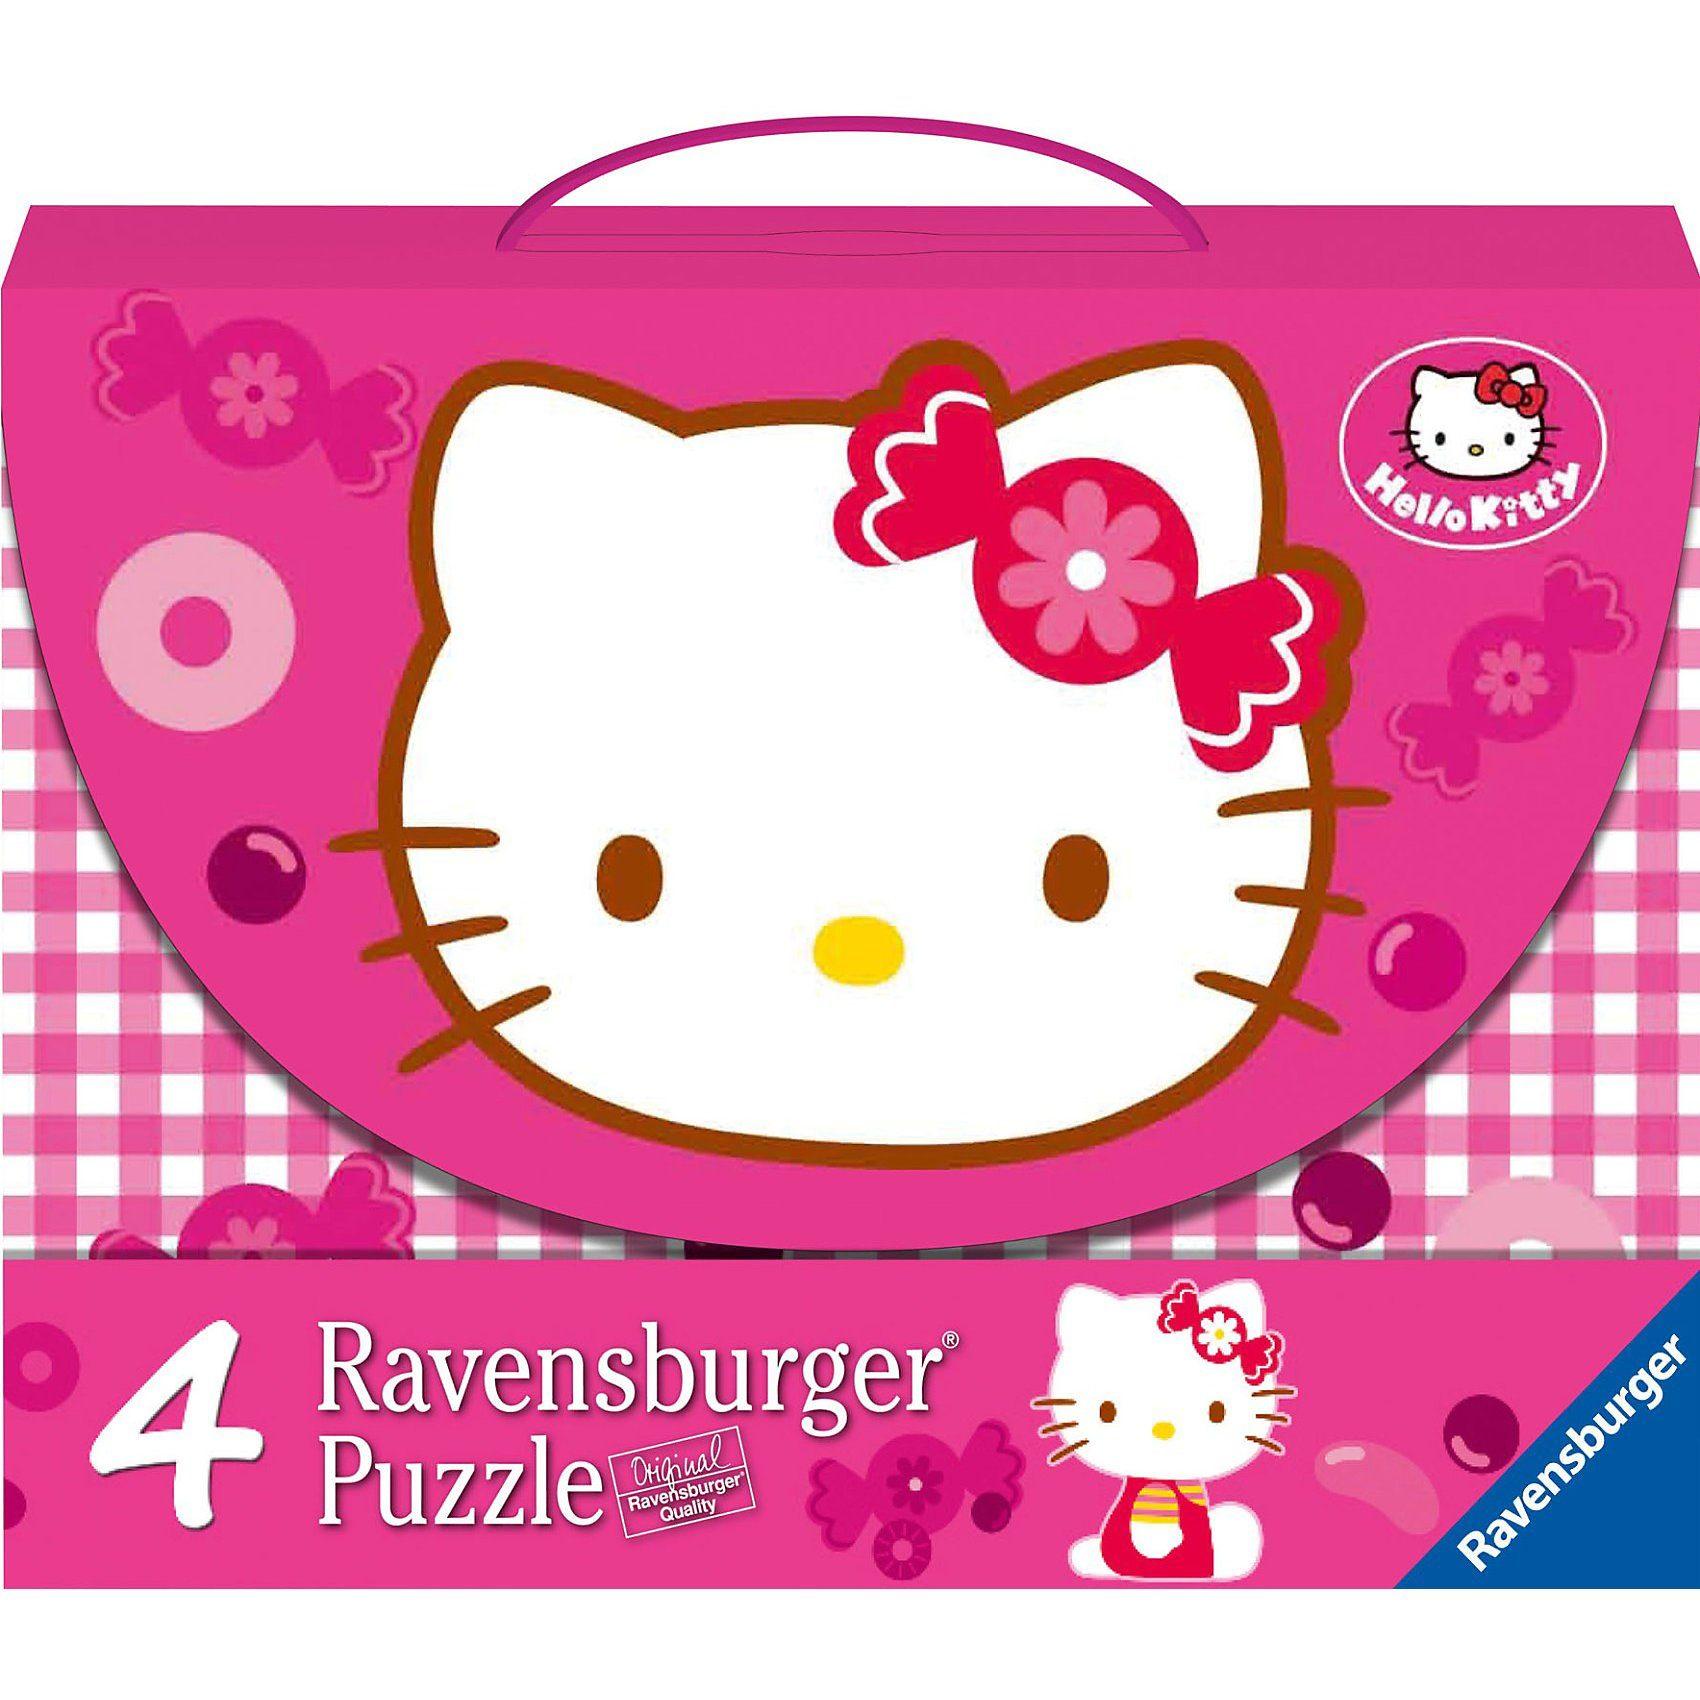 Ravensburger Puzzlekoffer Süße Hello Kitty 2 x 25/2 x 36 Teile